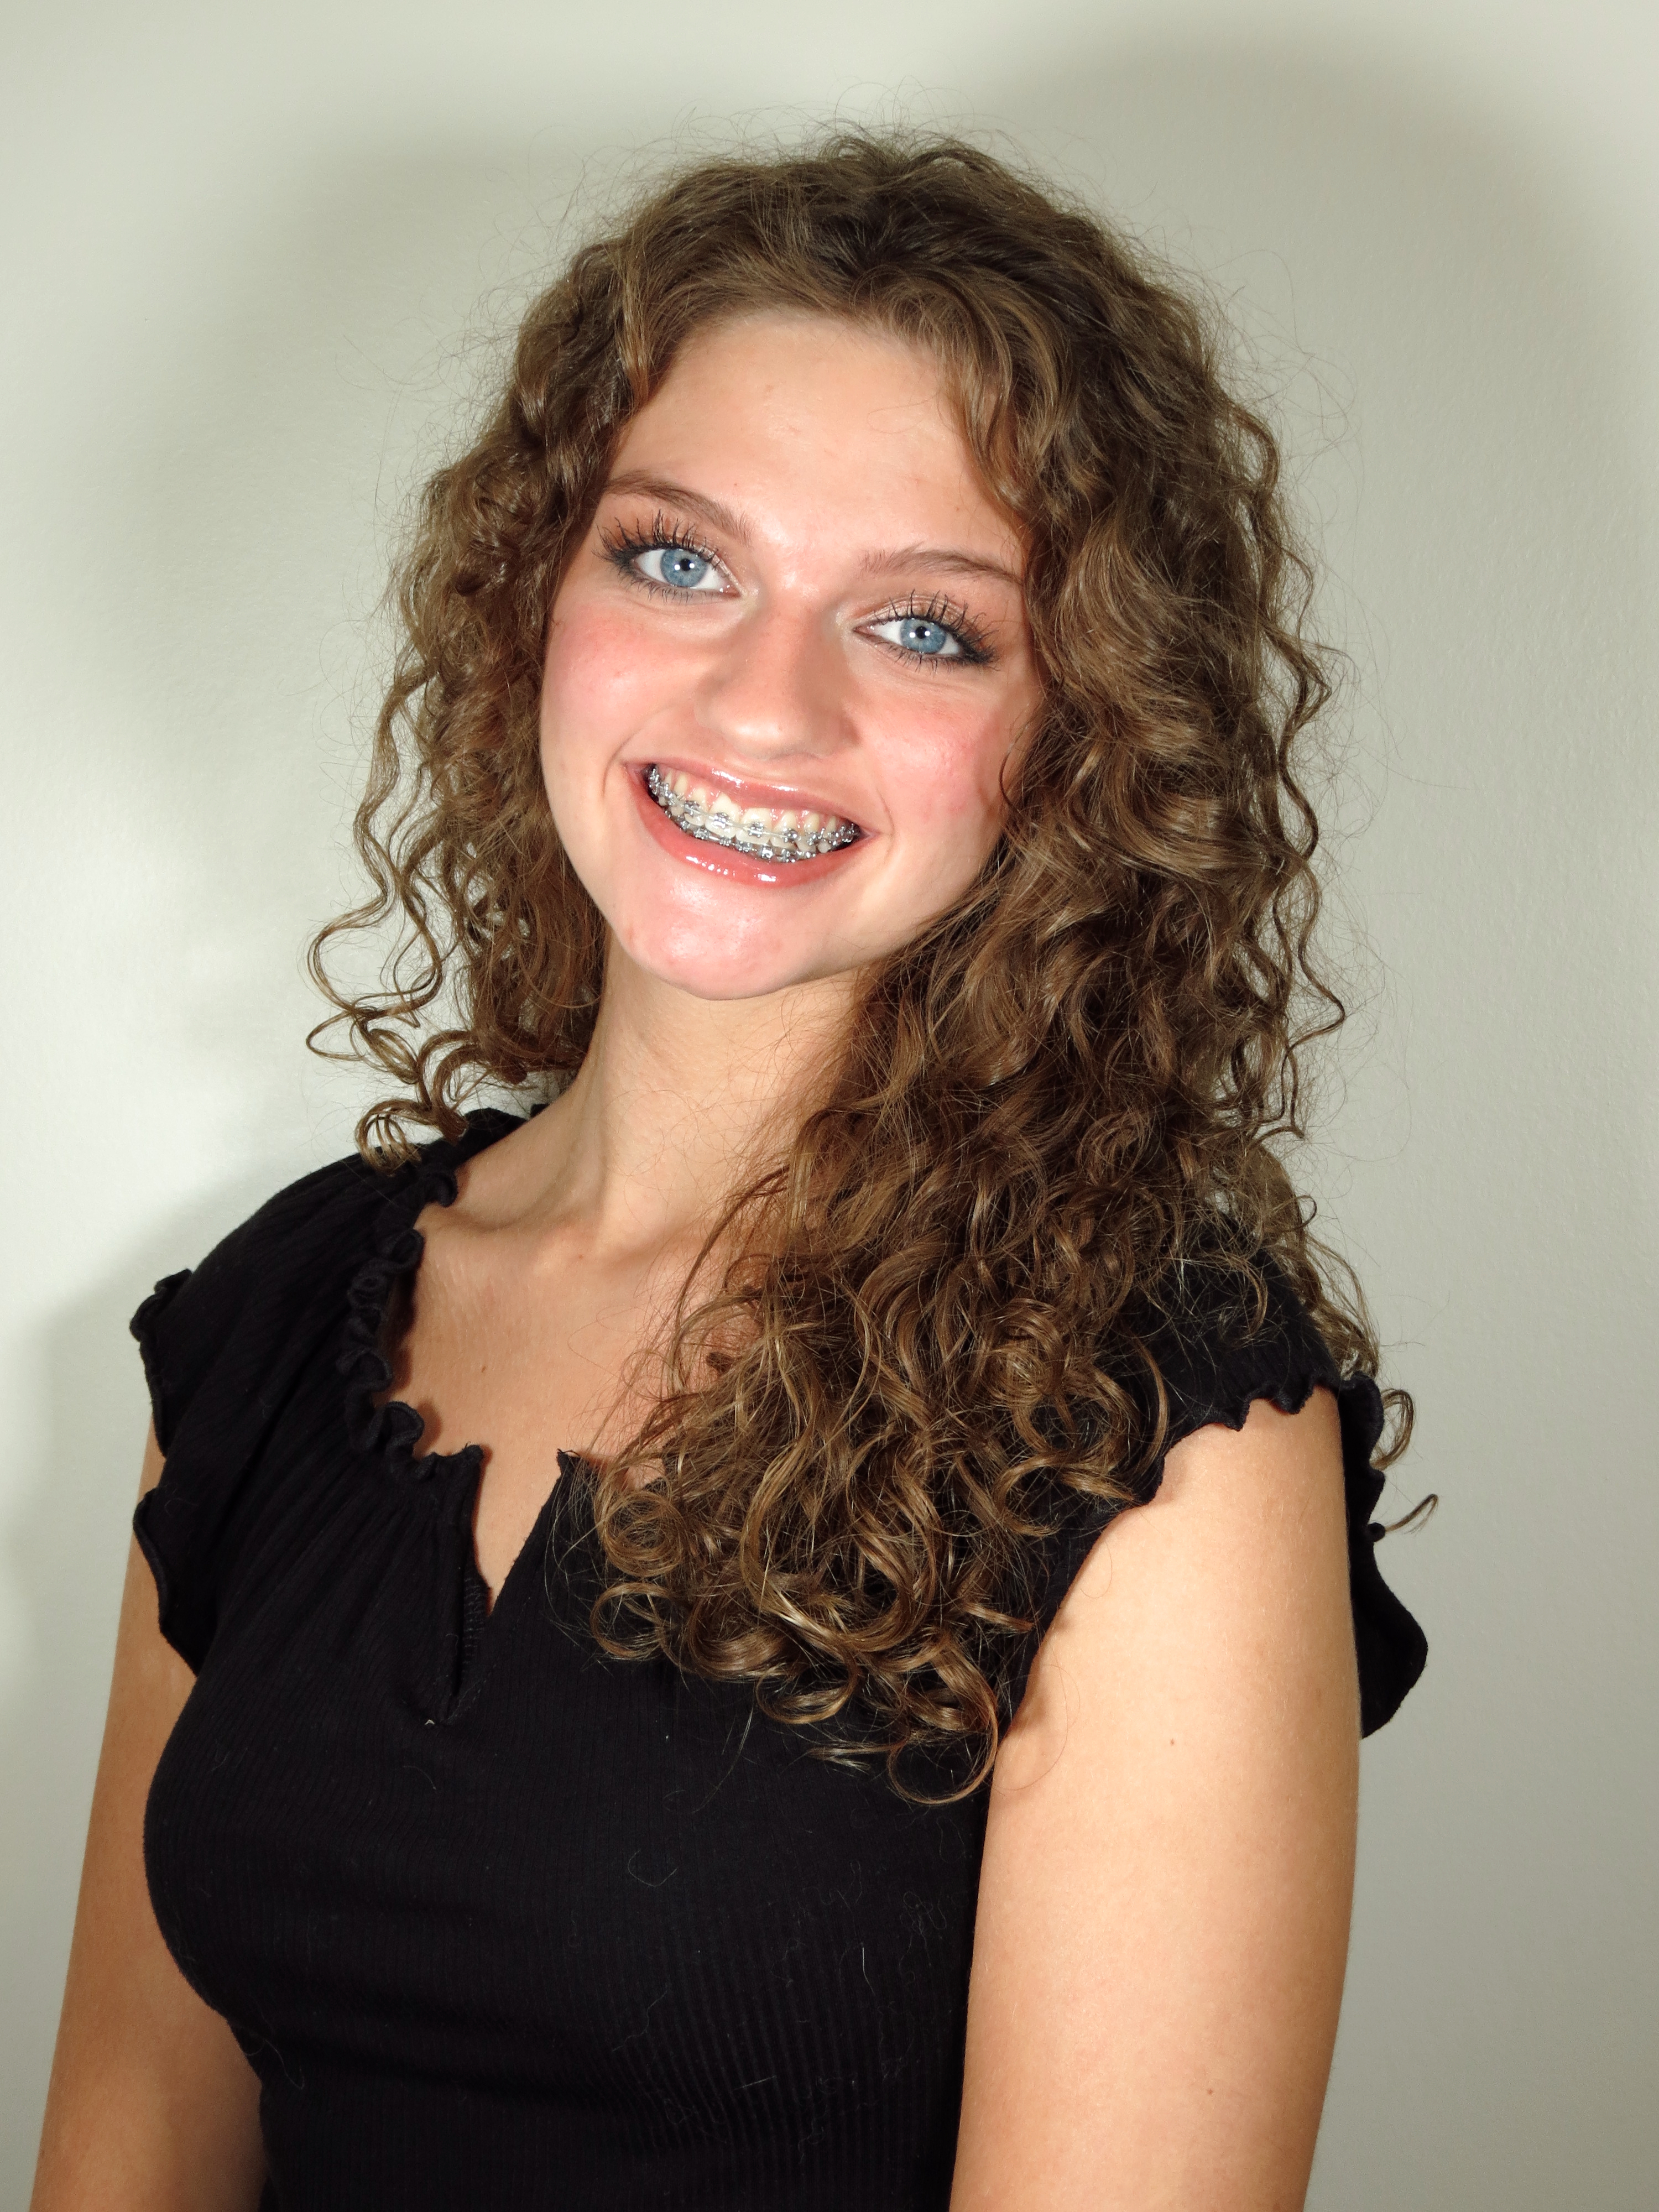 portrait photo of Chardon High School senior Olivia Nelson